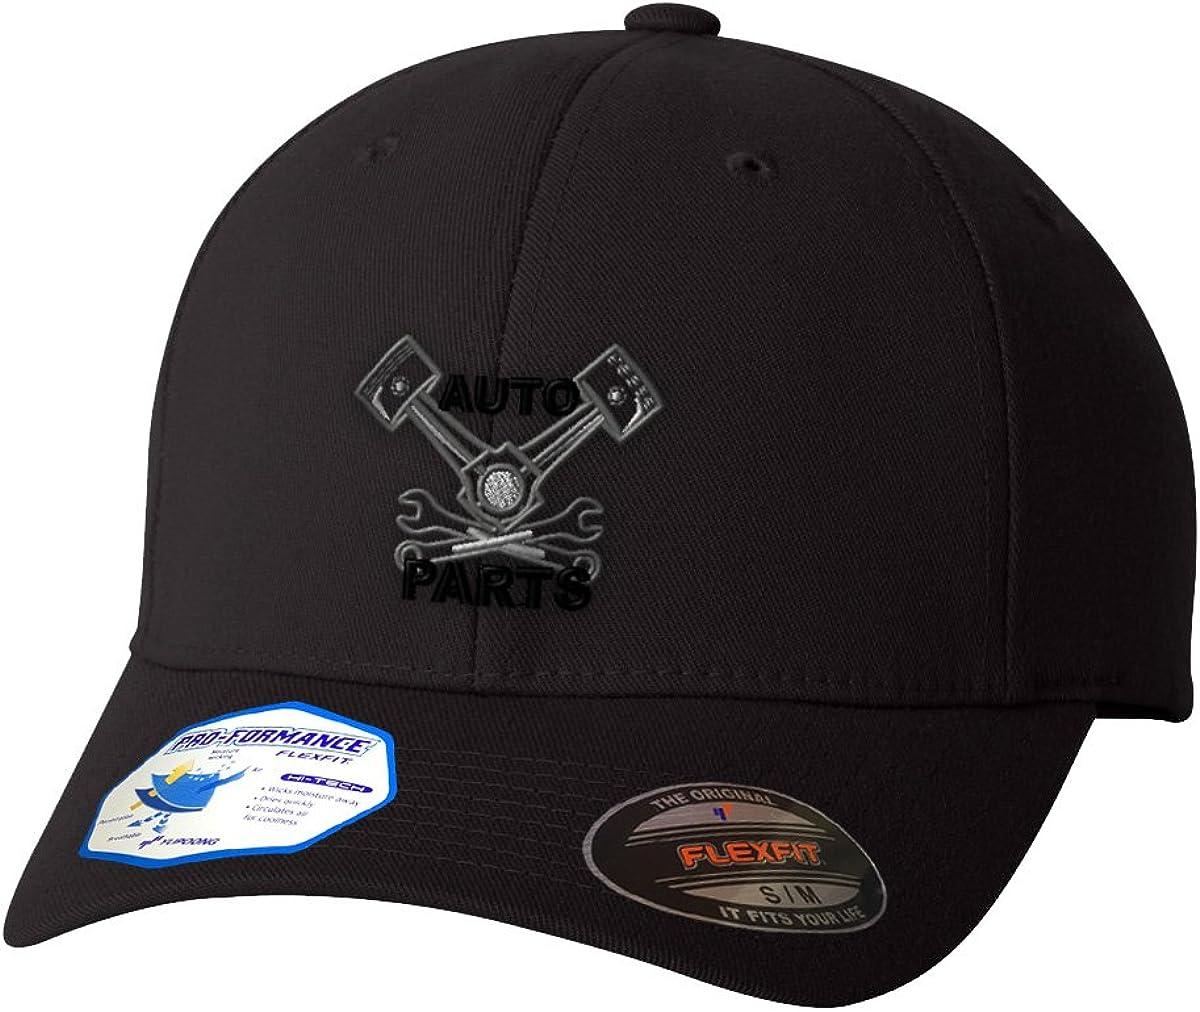 50#8 X 1//2 Phillips Washer Head Teks Tap Screws Clipsandfasteners Inc